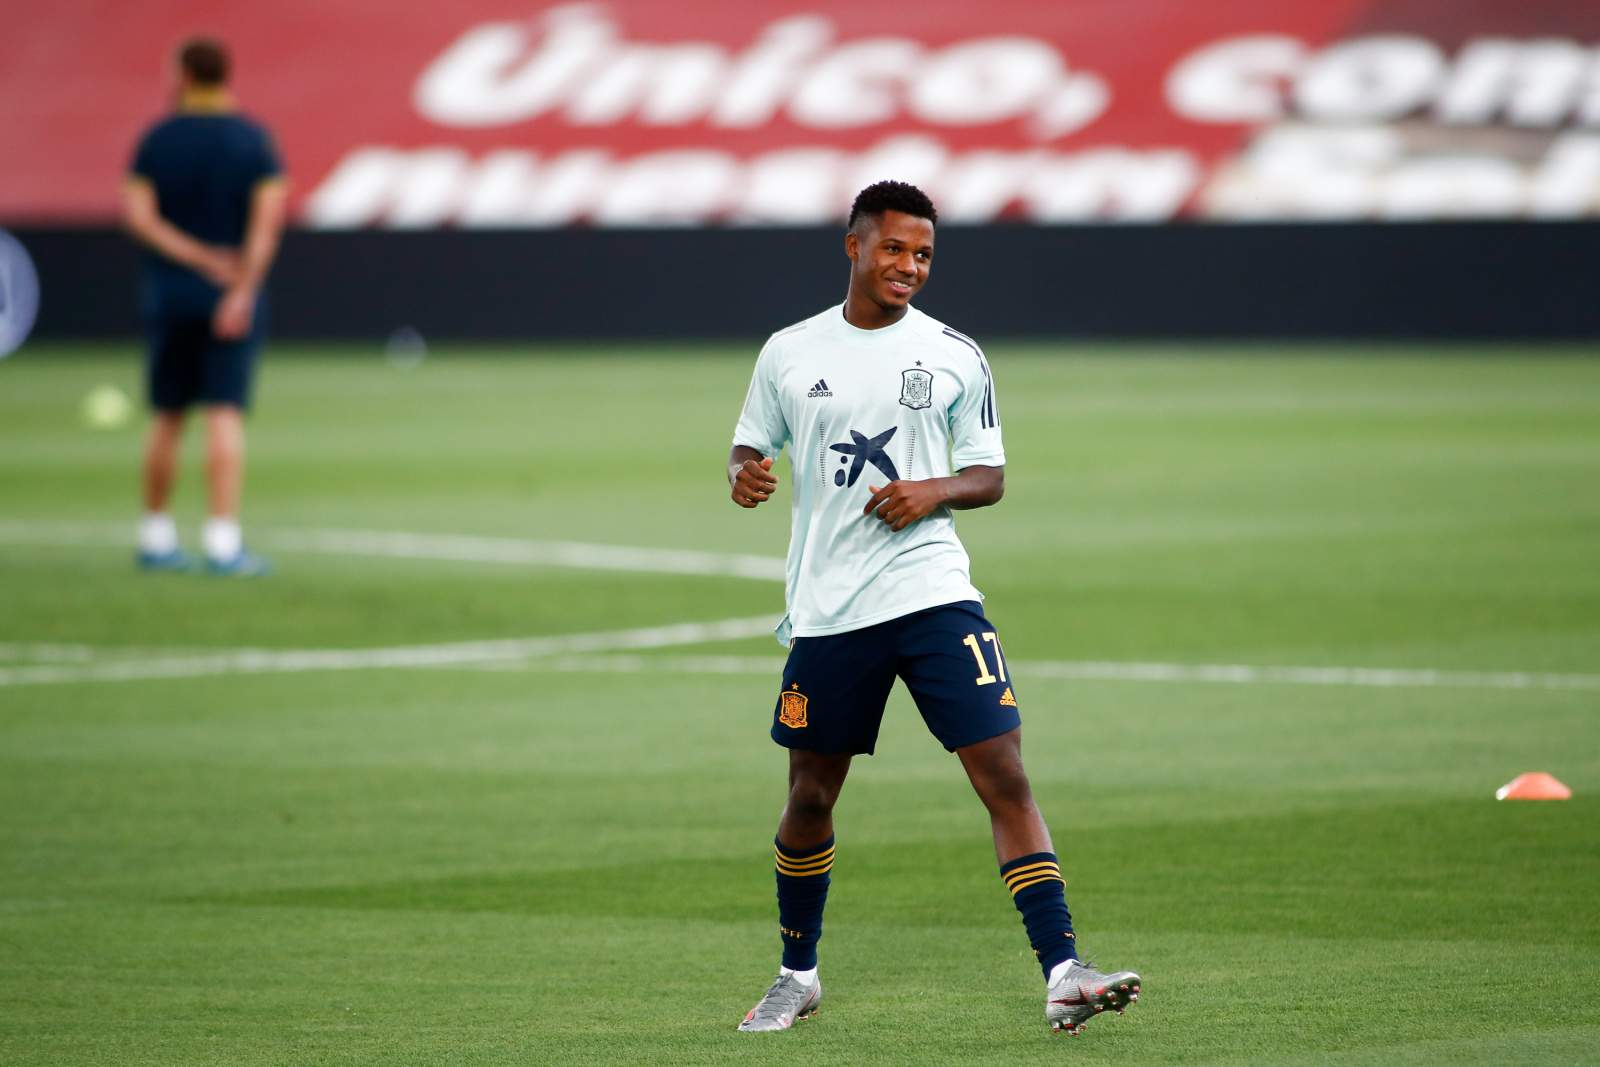 «Ювентус» и «Манчестер Юнайтед» интересуются Фати